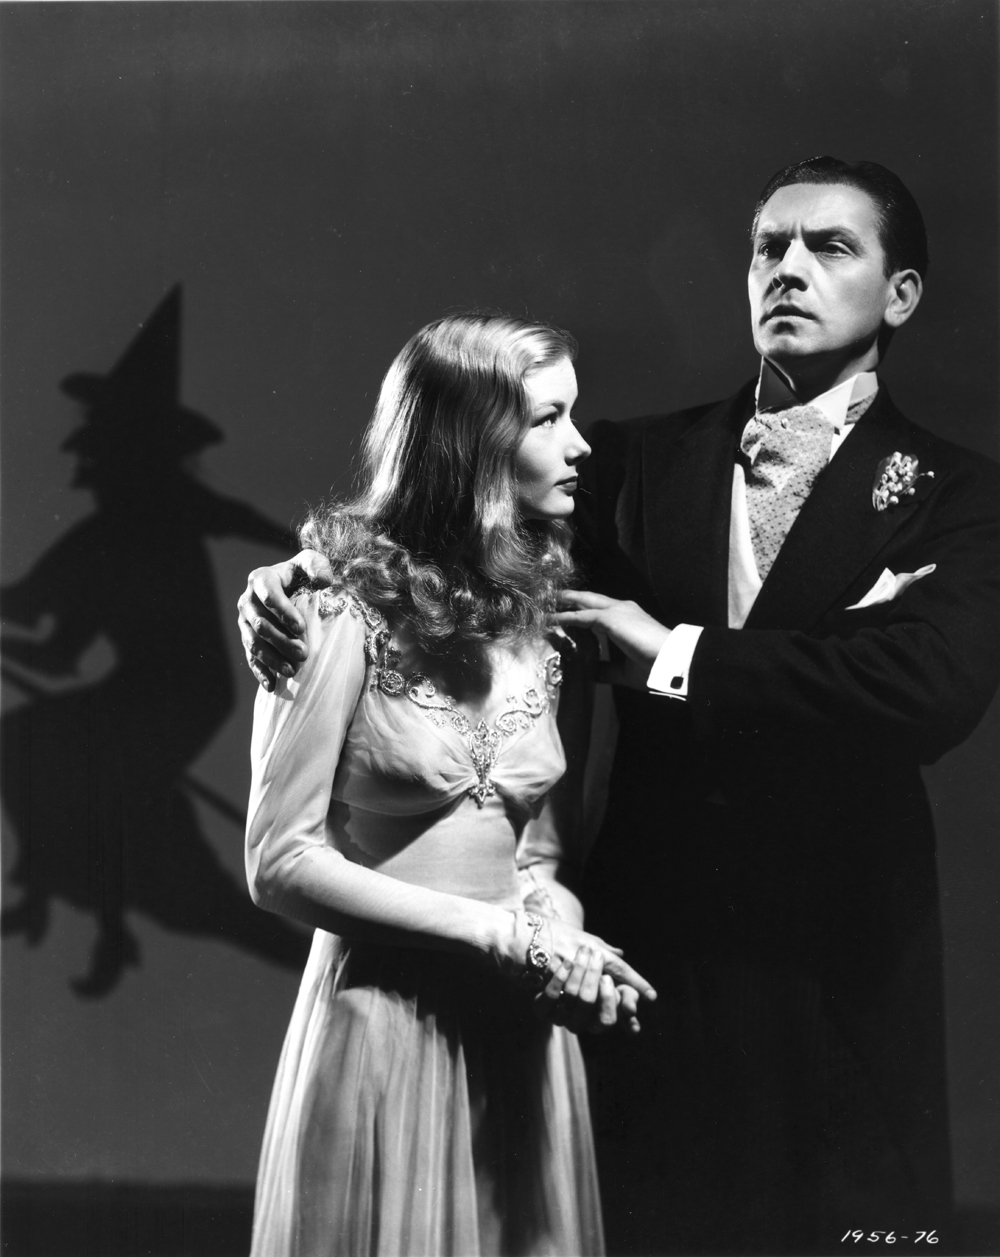 http://4.bp.blogspot.com/-tAdpW5_qg7I/TqhoNWtbo8I/AAAAAAAAWu0/vEQuBwTmacE/s1600/I+Married+a+Witch+%252811%2529.jpg